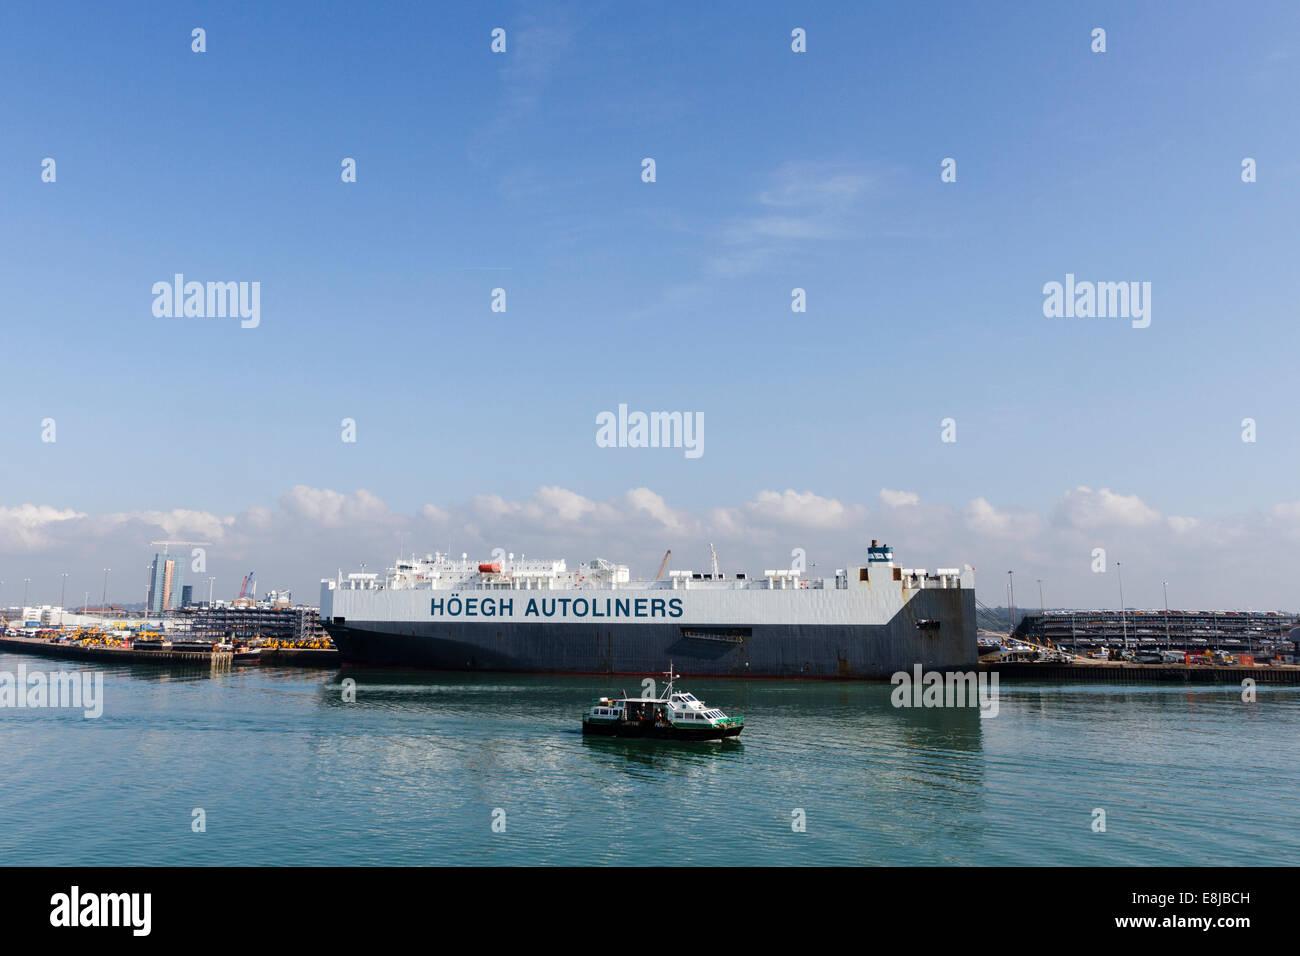 Hoegh Autoliners, car carrier, shipping company, Southampton docks, England, UK - Stock Image